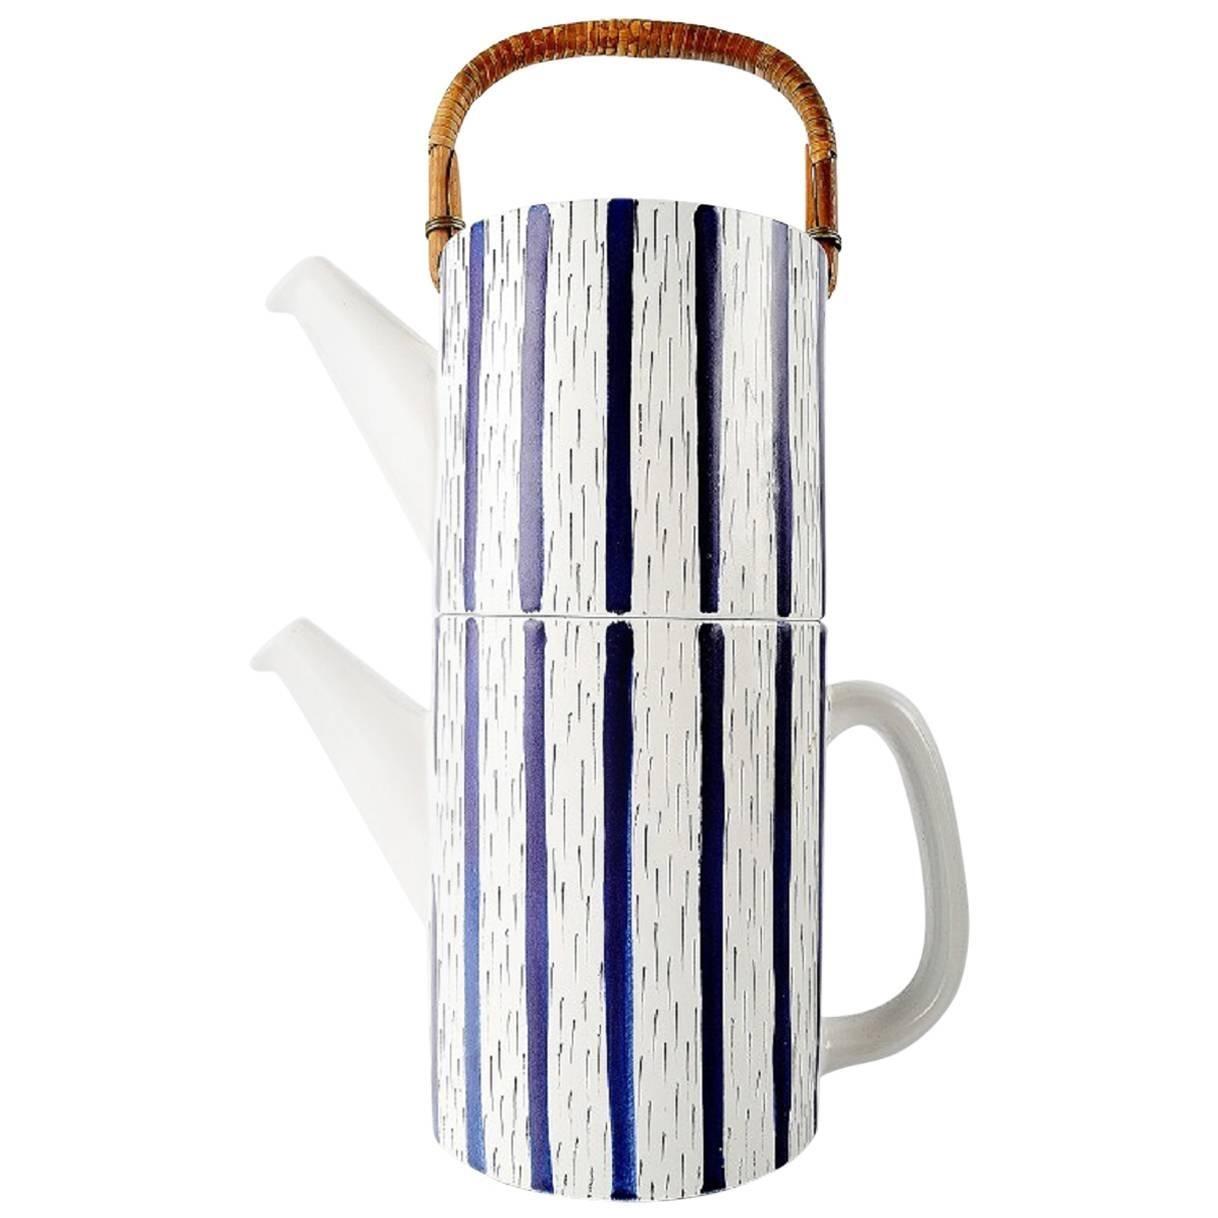 Rare Two-Piece Teapot, Design Stig Lindberg, Gustavsberg